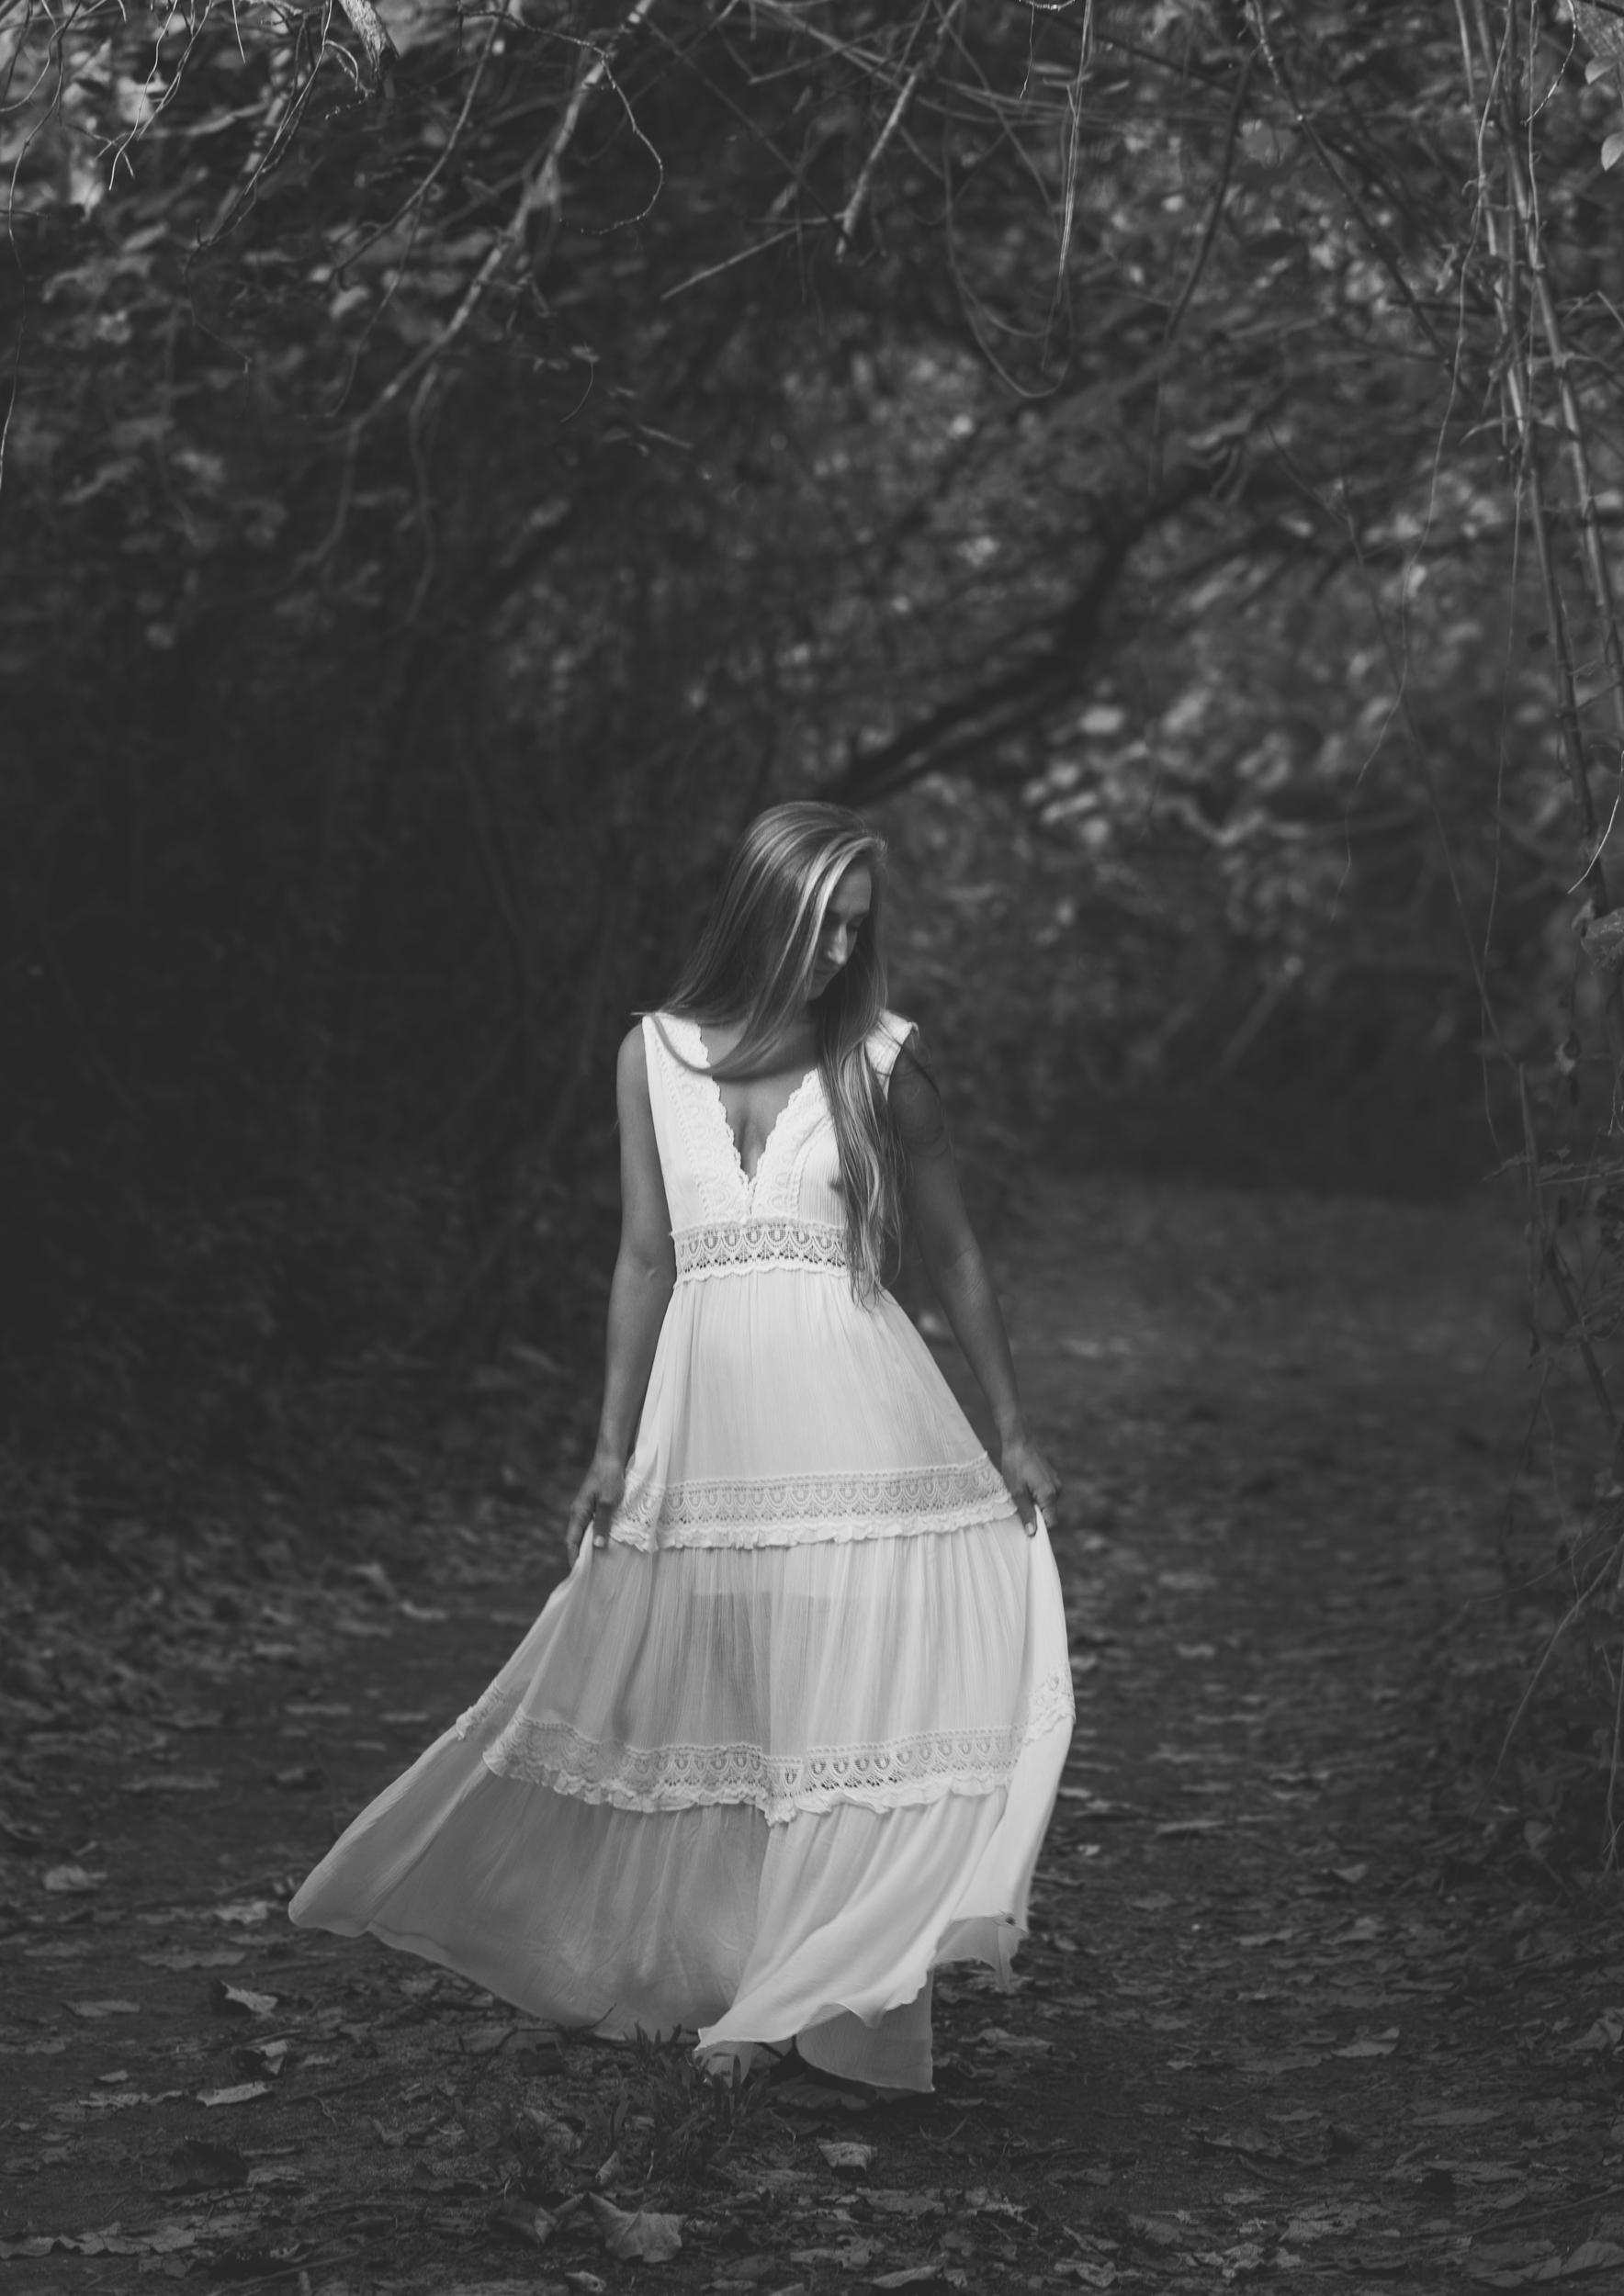 woman-guam-portrait-photographer-ipan-roxanne-augusta-1.jpg